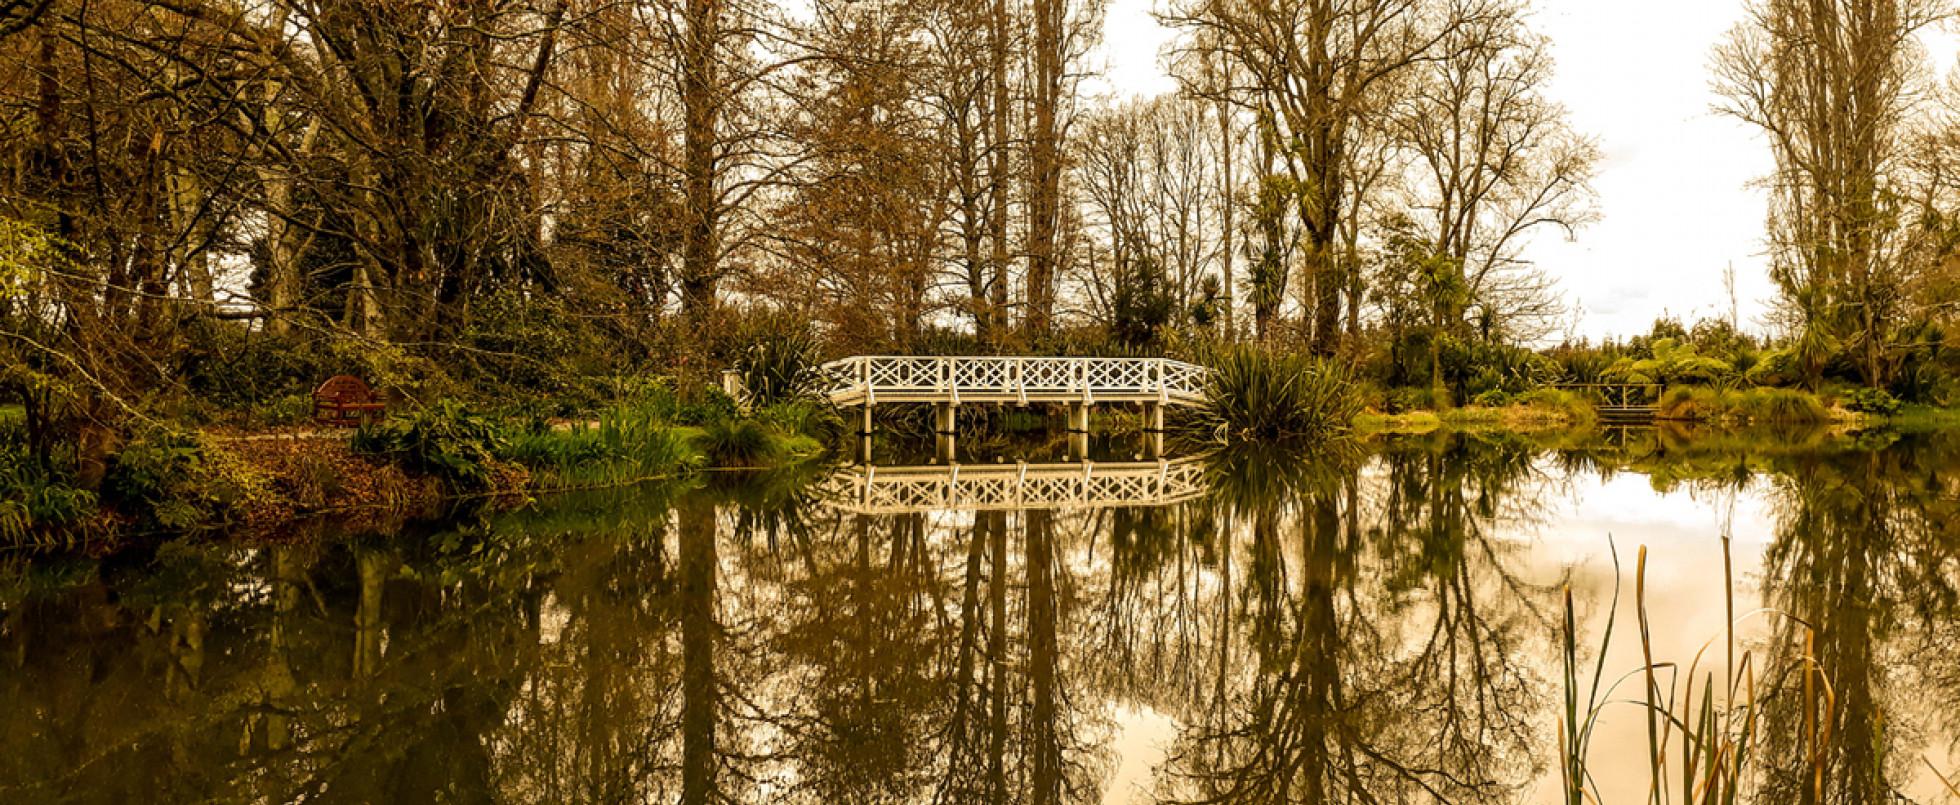 Fernside Gardens: Lothlorien / Gladden Fields